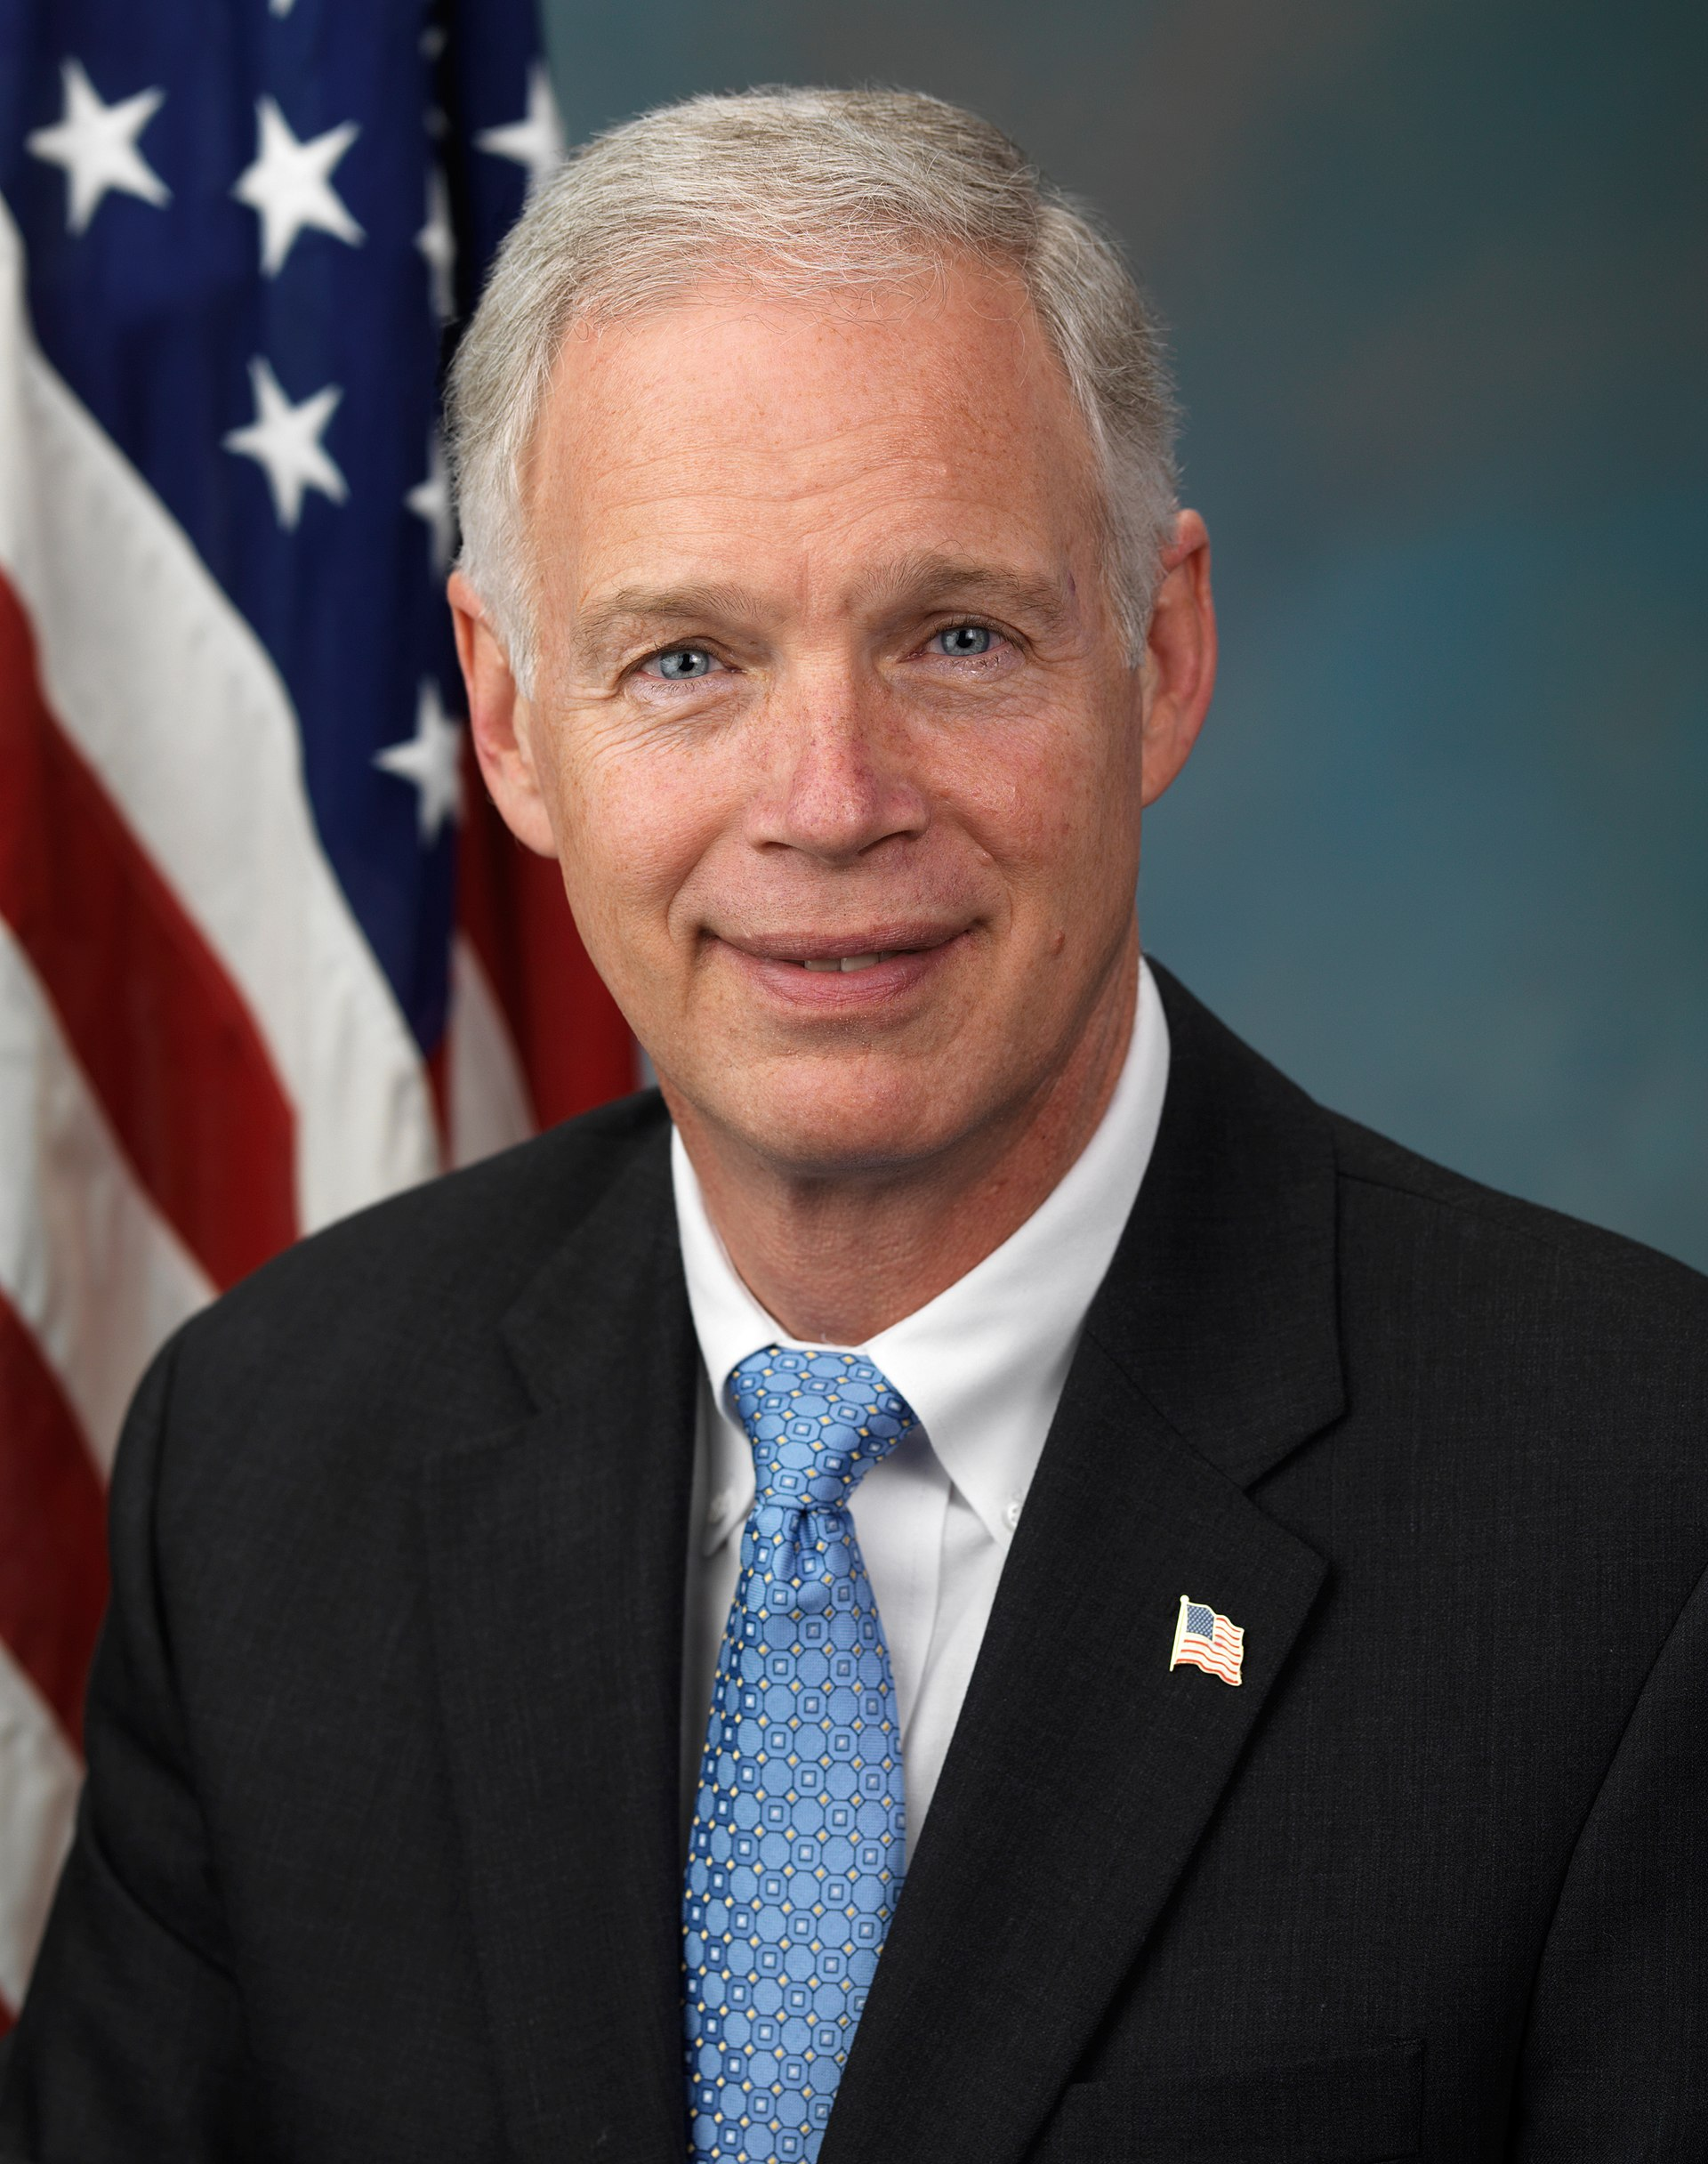 Ron Johnson, official portrait, 112th Congress.jpg